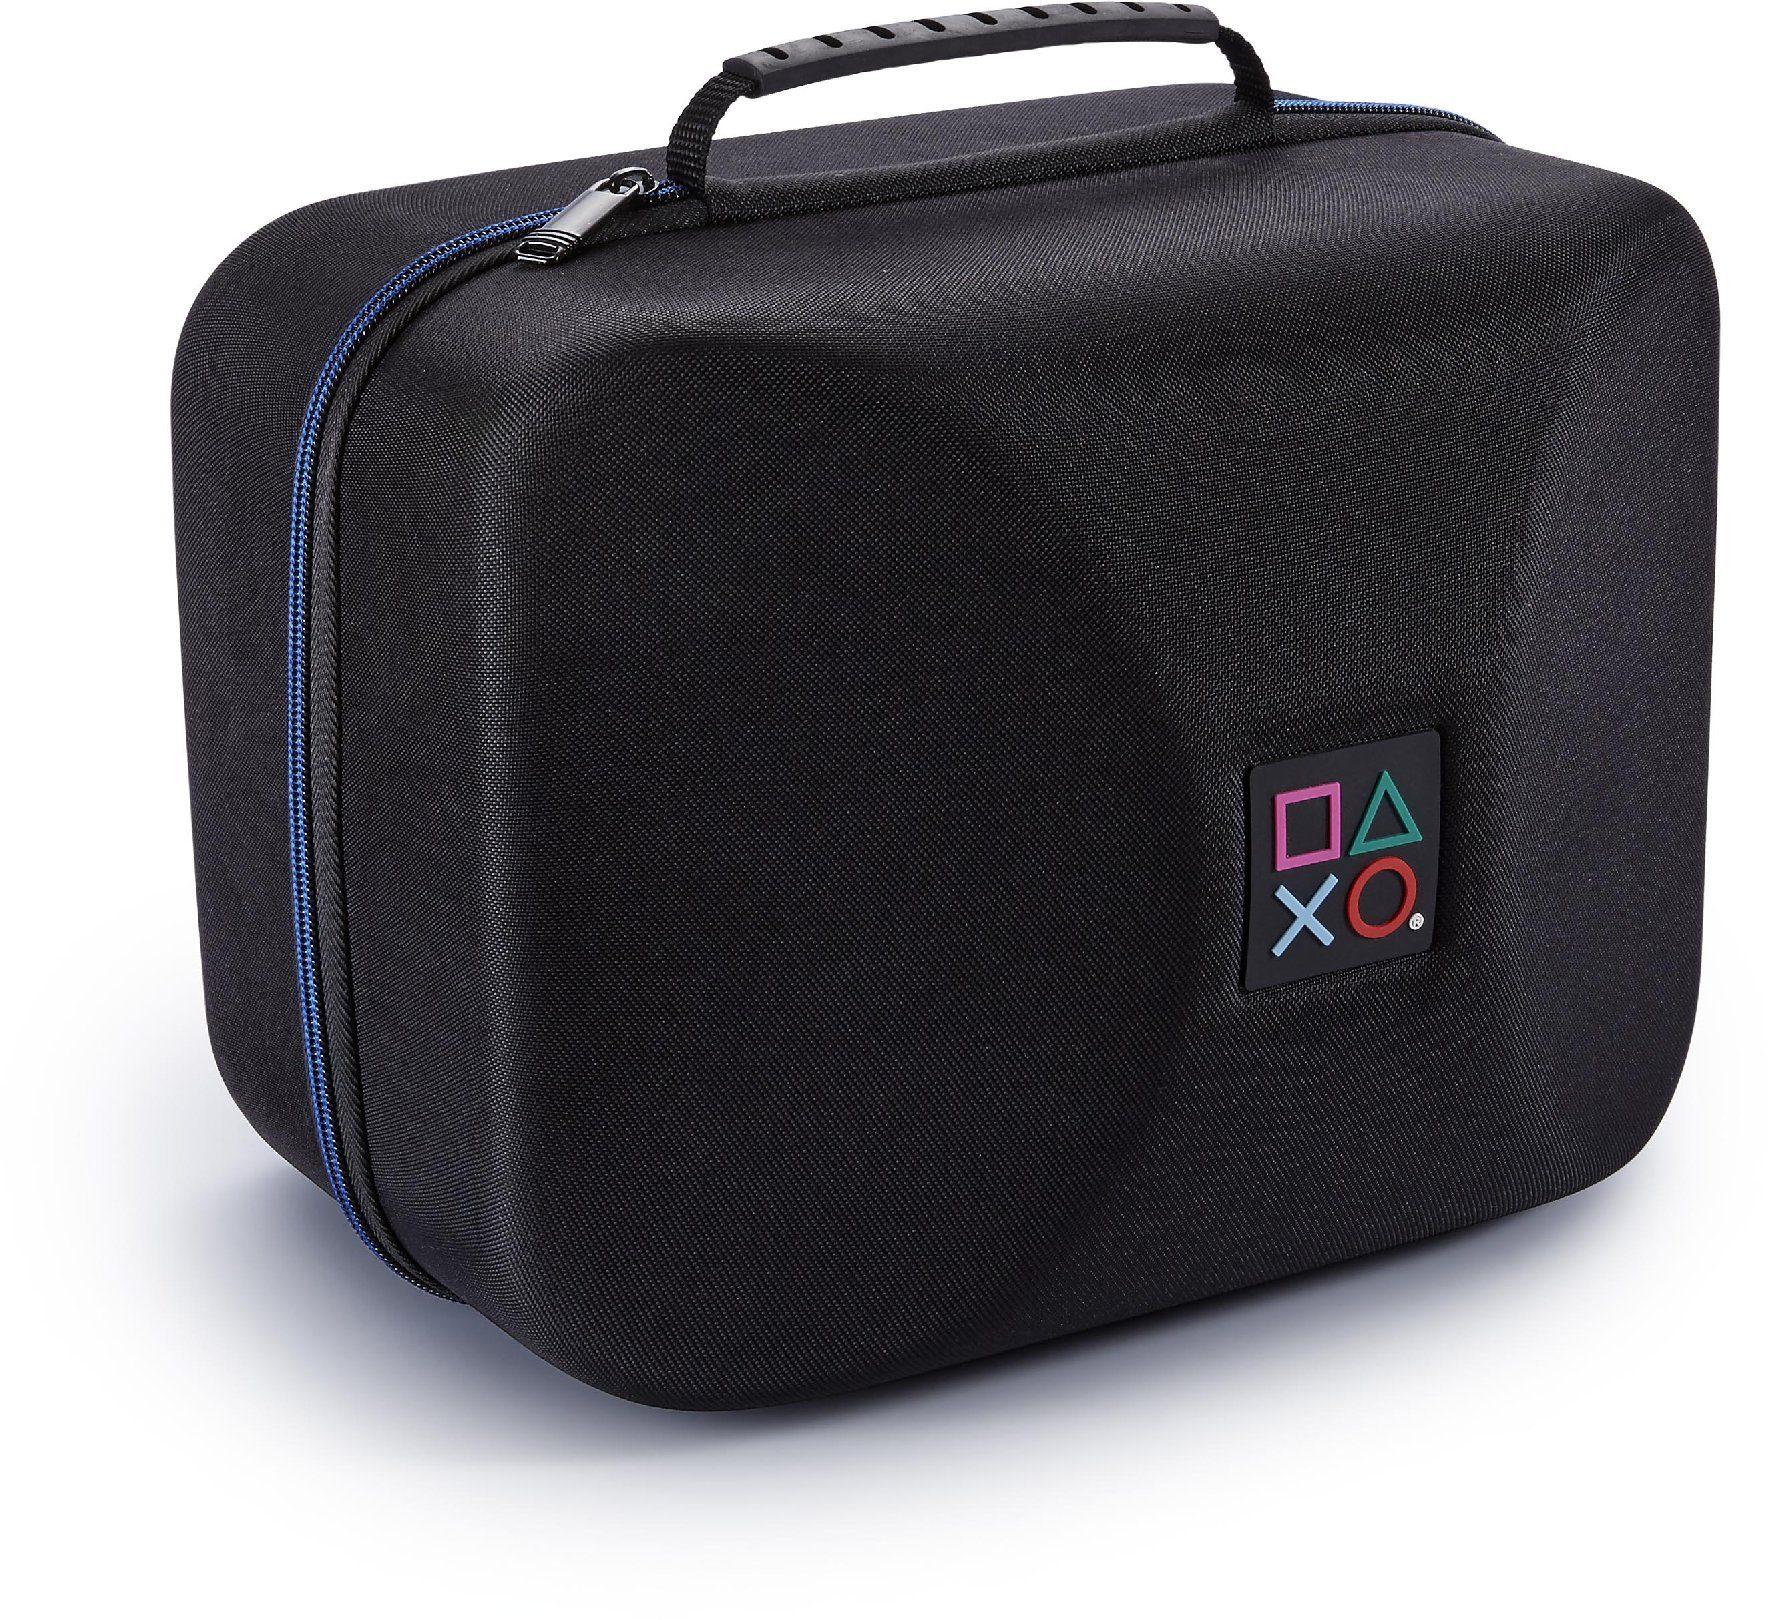 BIGBEN Tasche PS4 VR Case (Offizielle Playstation Lizenz) »(PS4)«